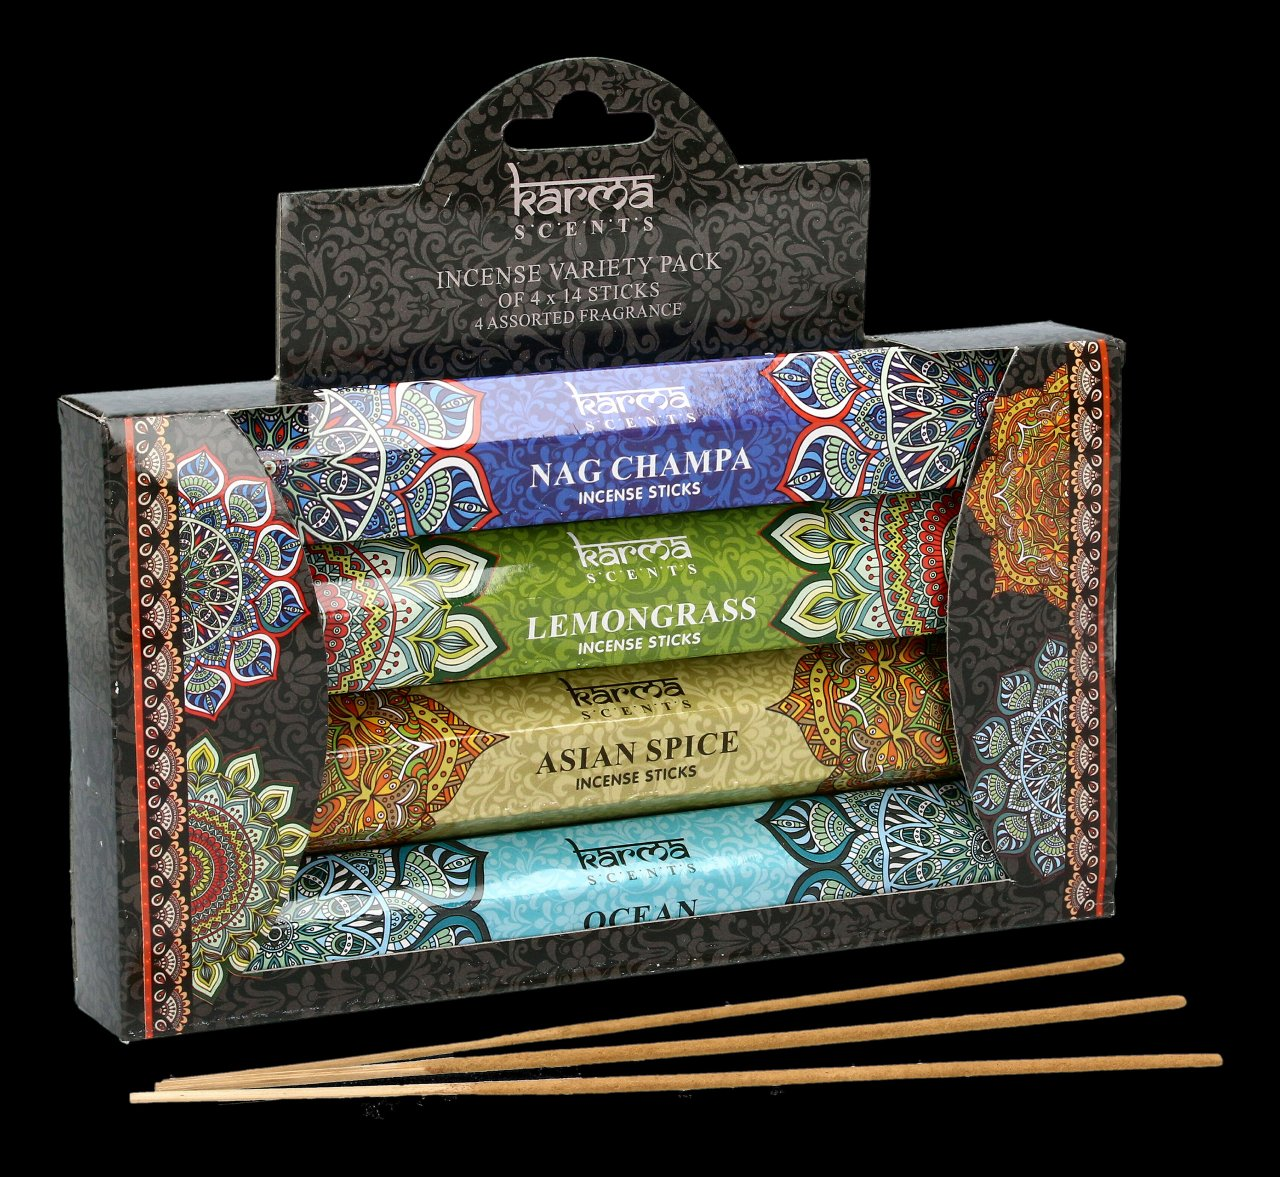 Incense Sticks Box - Karma Gift Pack